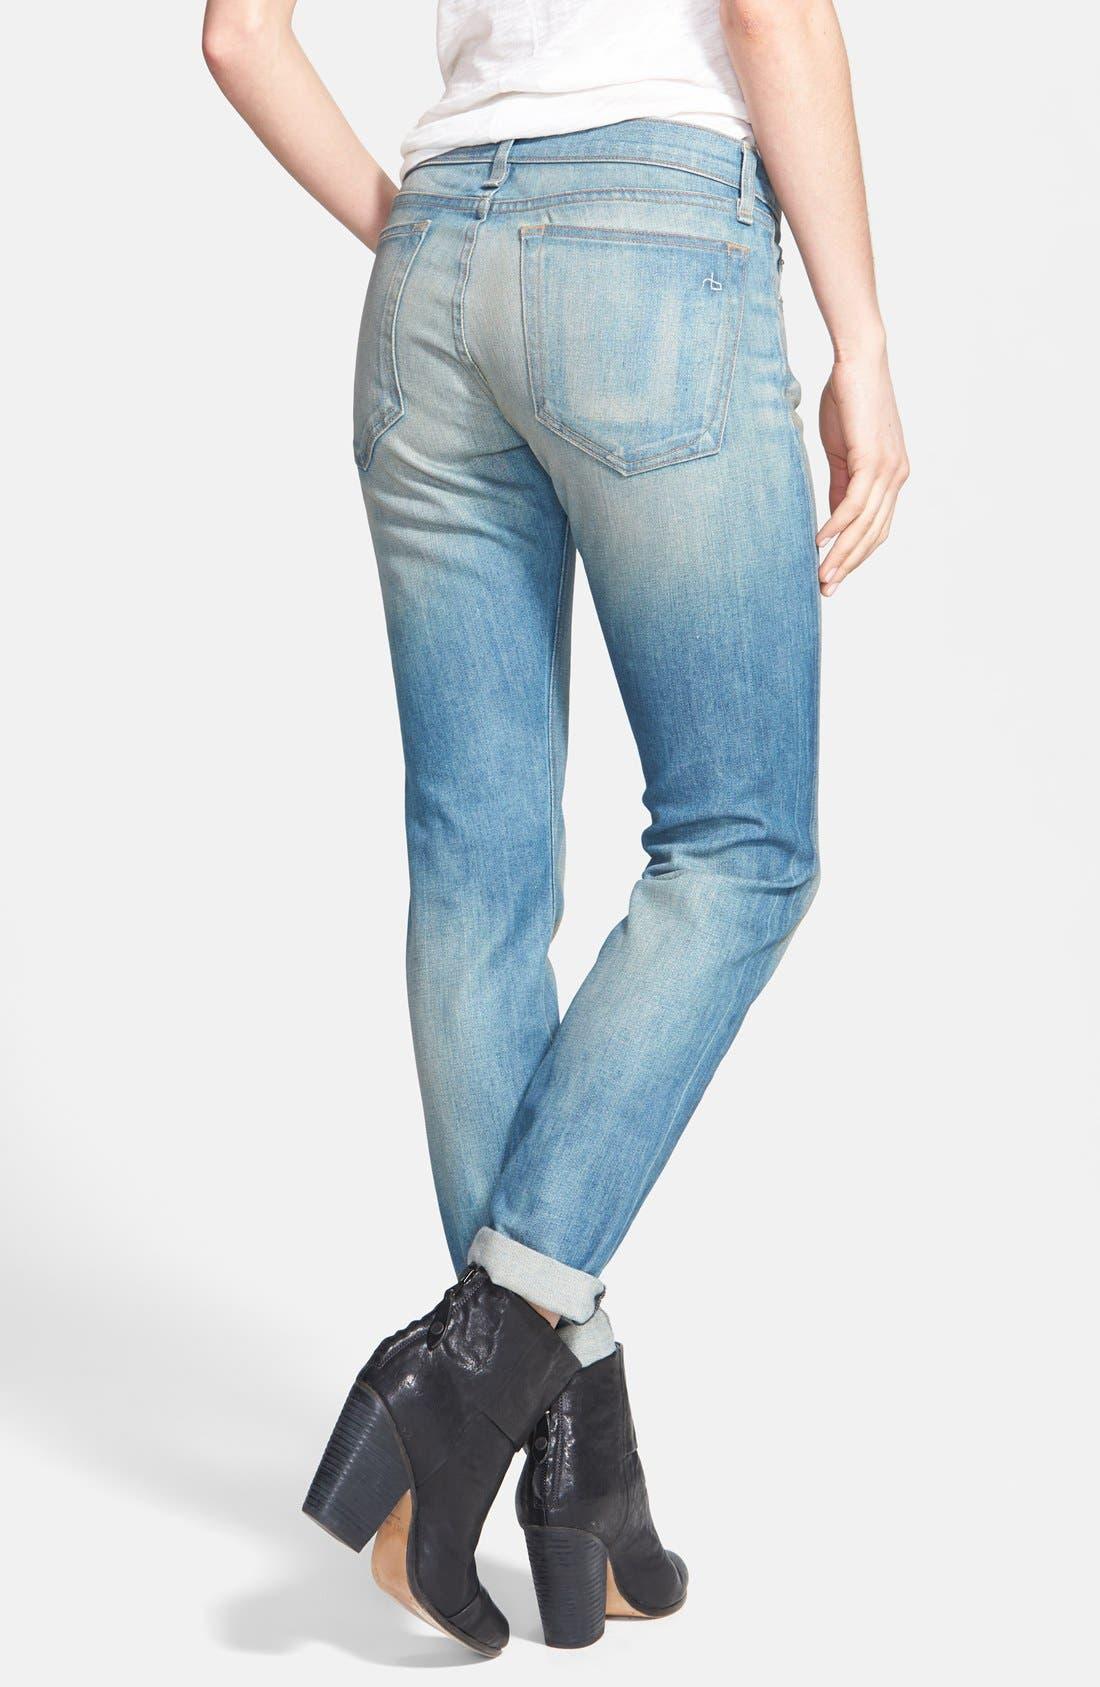 Alternate Image 2  - rag & bone/JEAN 'The Dre' Slim Fit Boyfriend Jeans (Greencast)